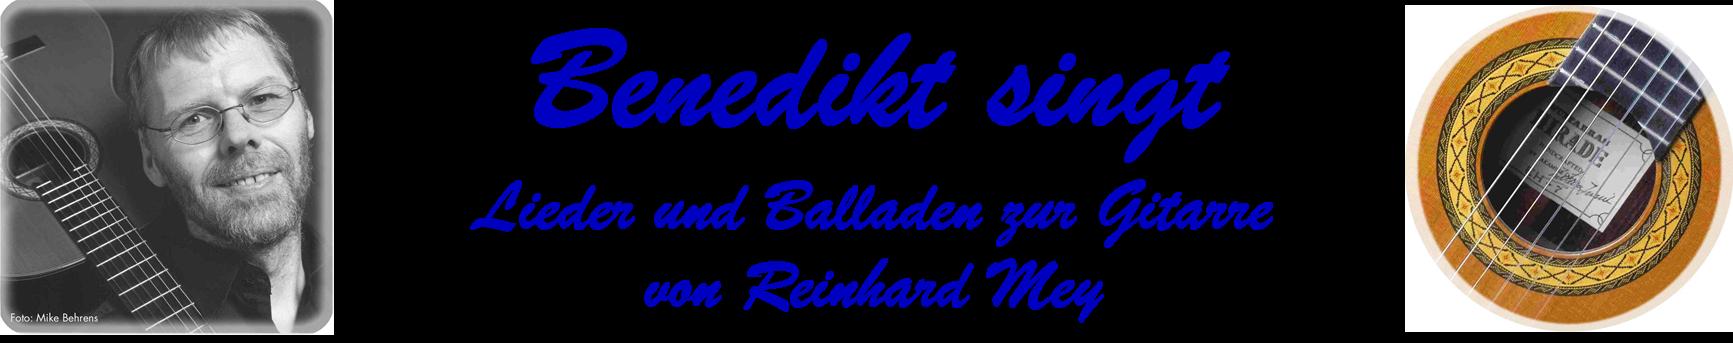 Benedikt singt Reinhard Mey u.a.